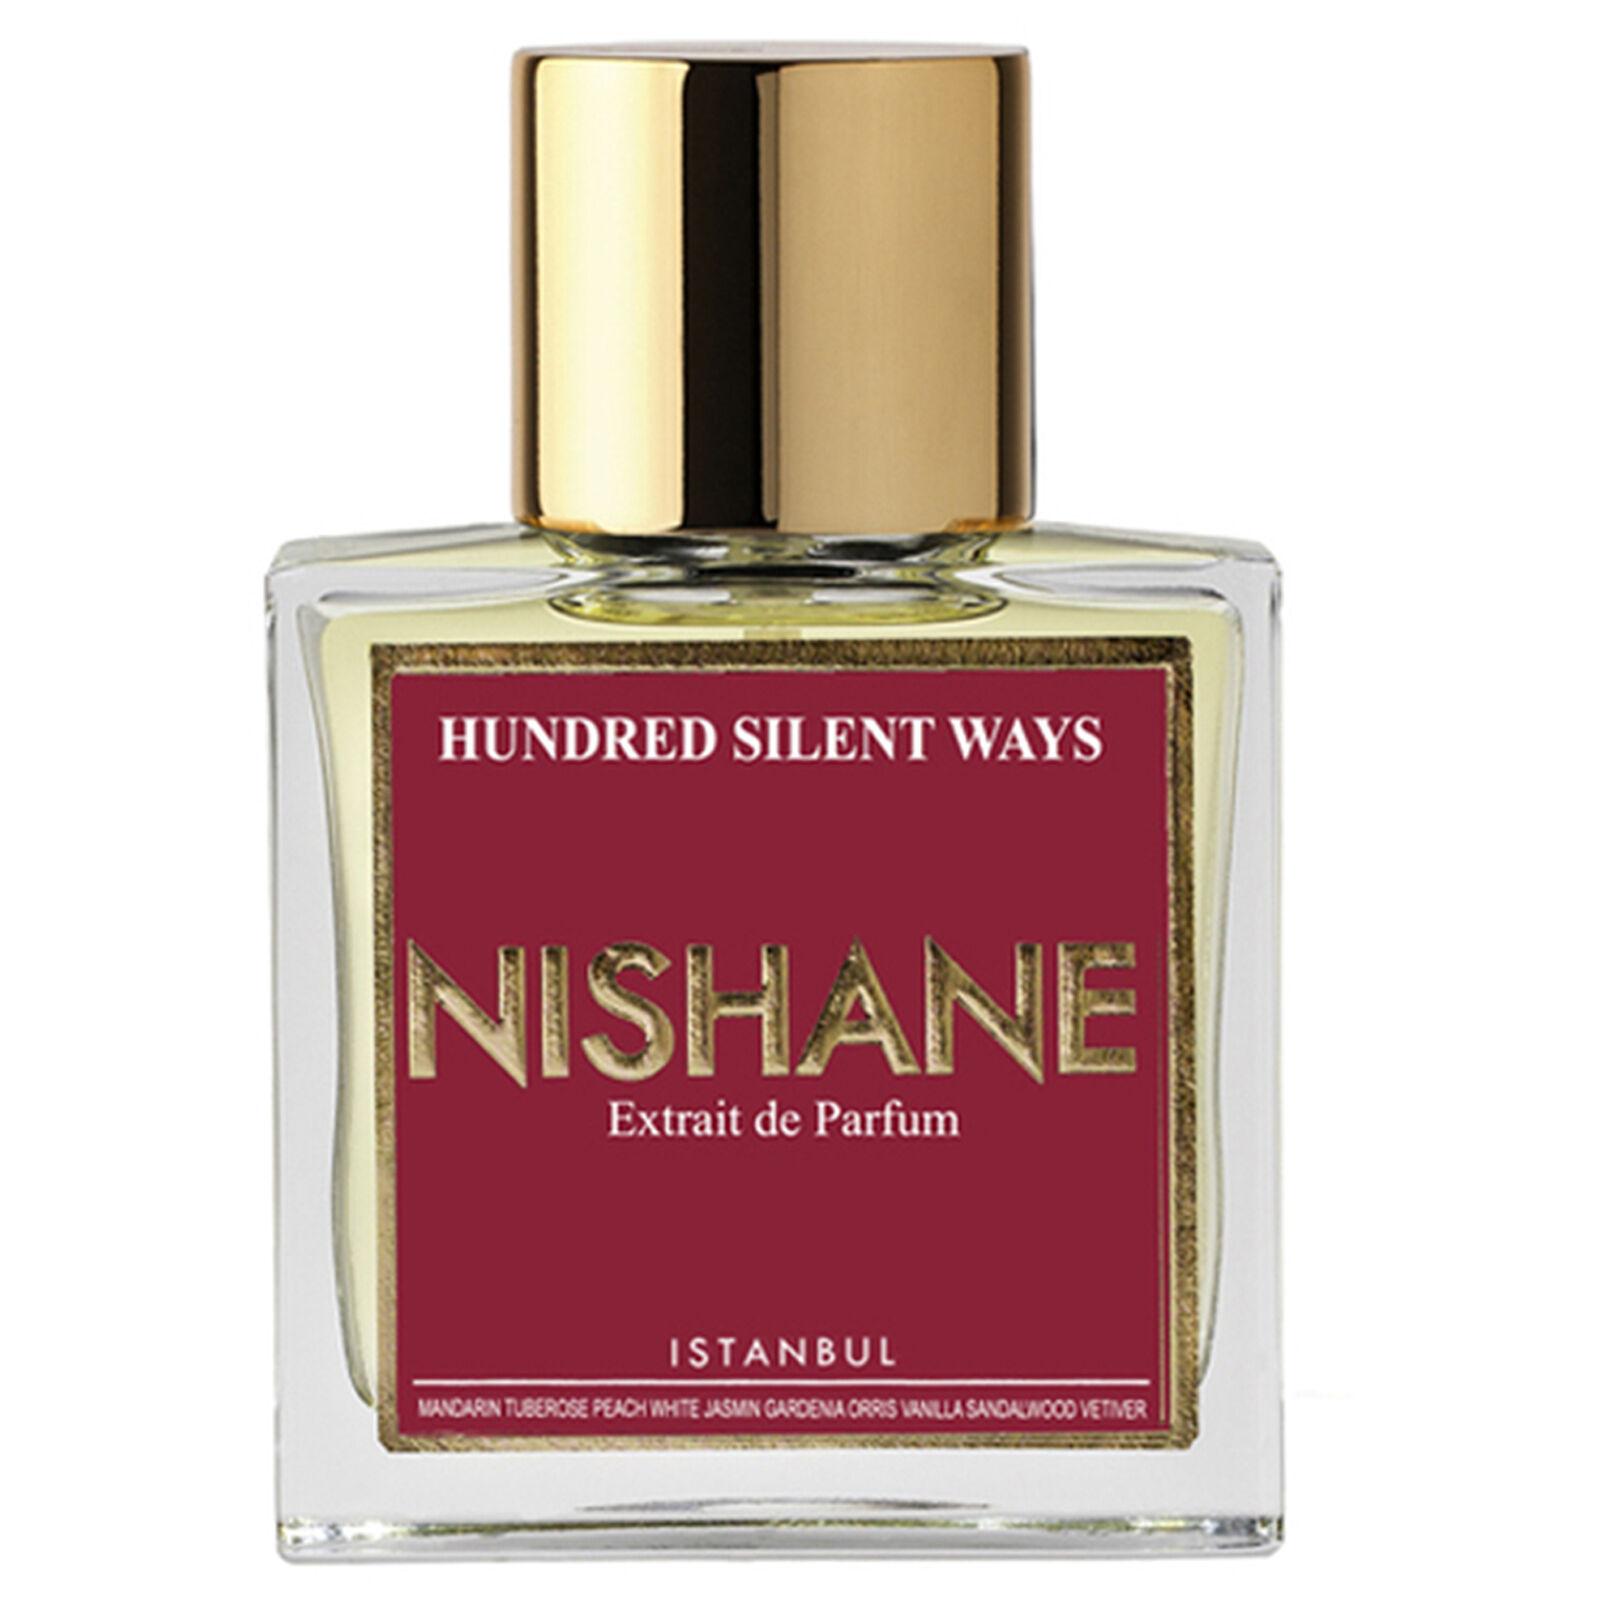 Nishane Istanbul Hundred silent ways extrait de parfum 50 ml  - White